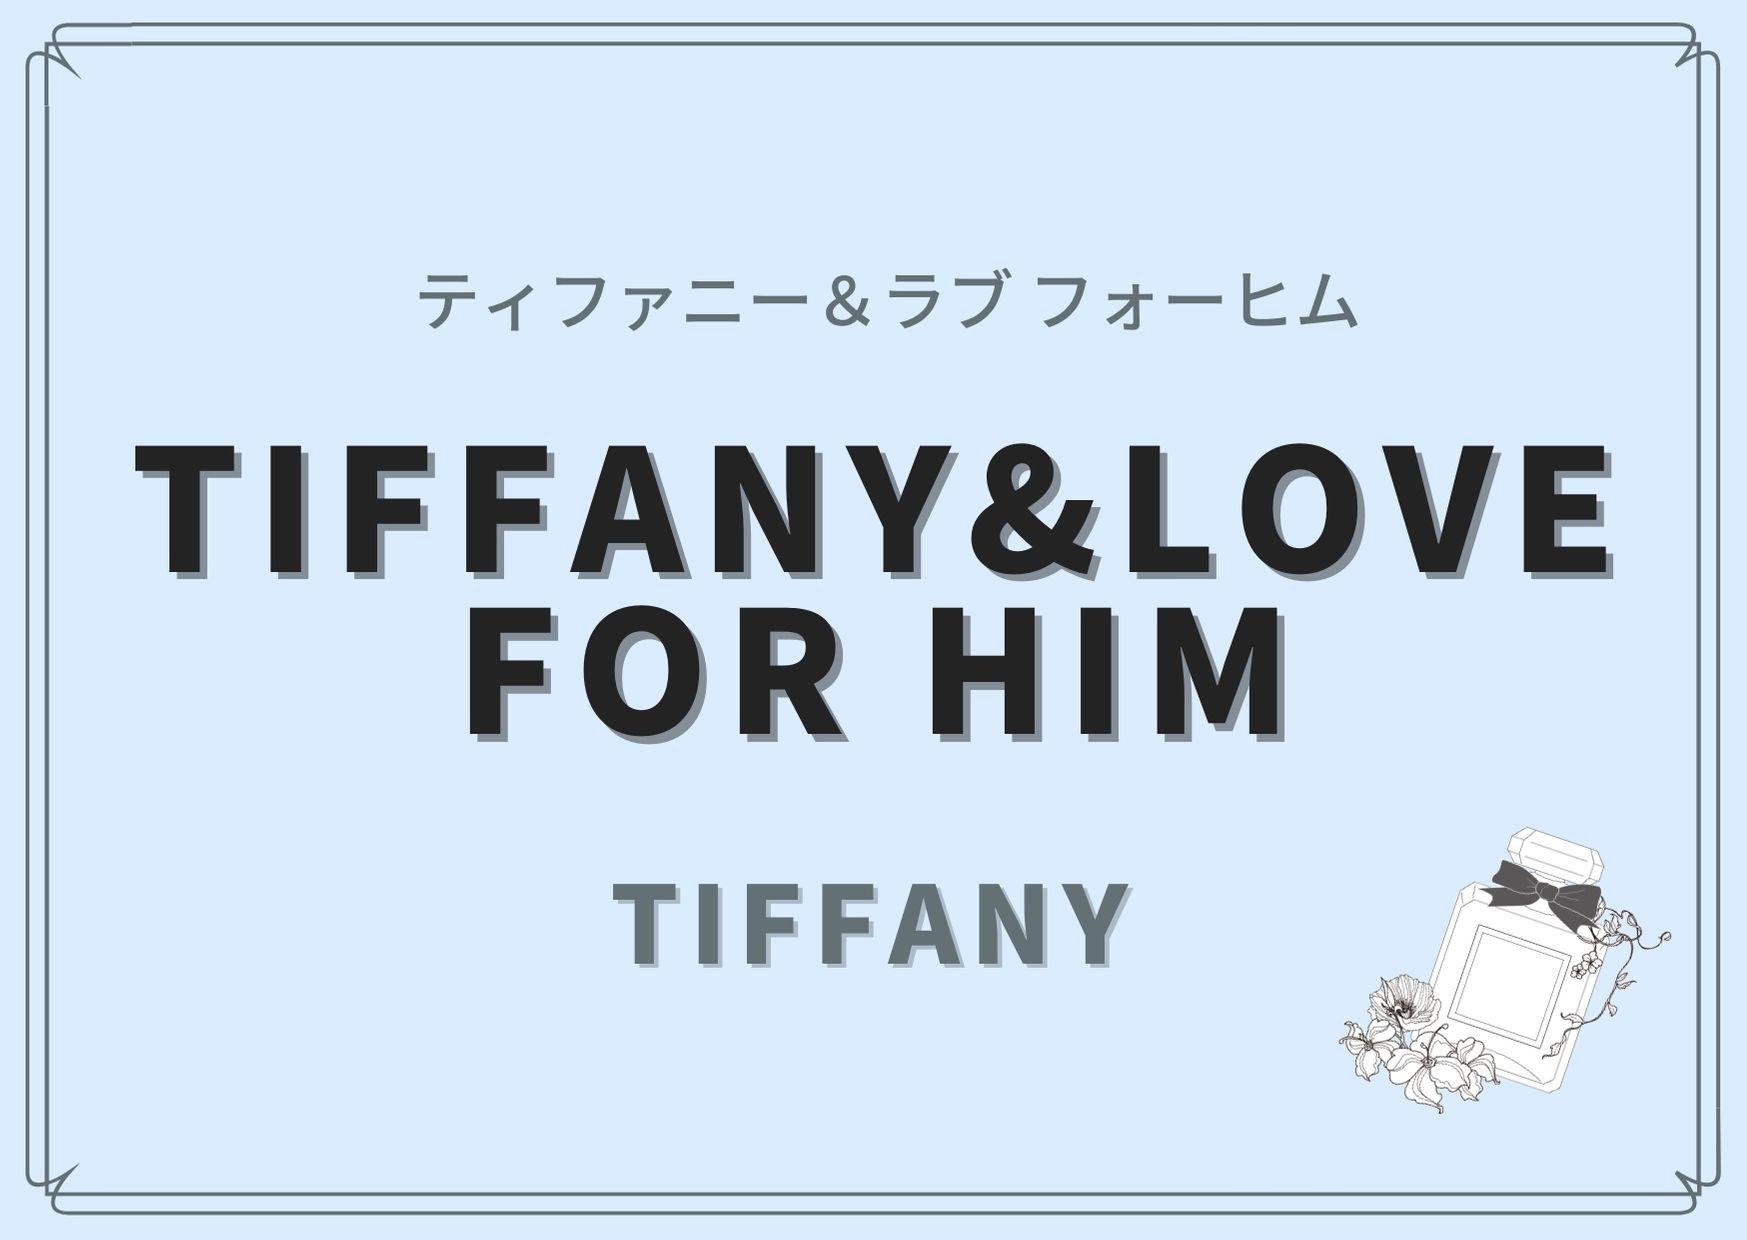 TIFFANY&LOVE FOR HIM(ティファニー&ラブ フォーヒム)/TIFFANY(ティファニー )